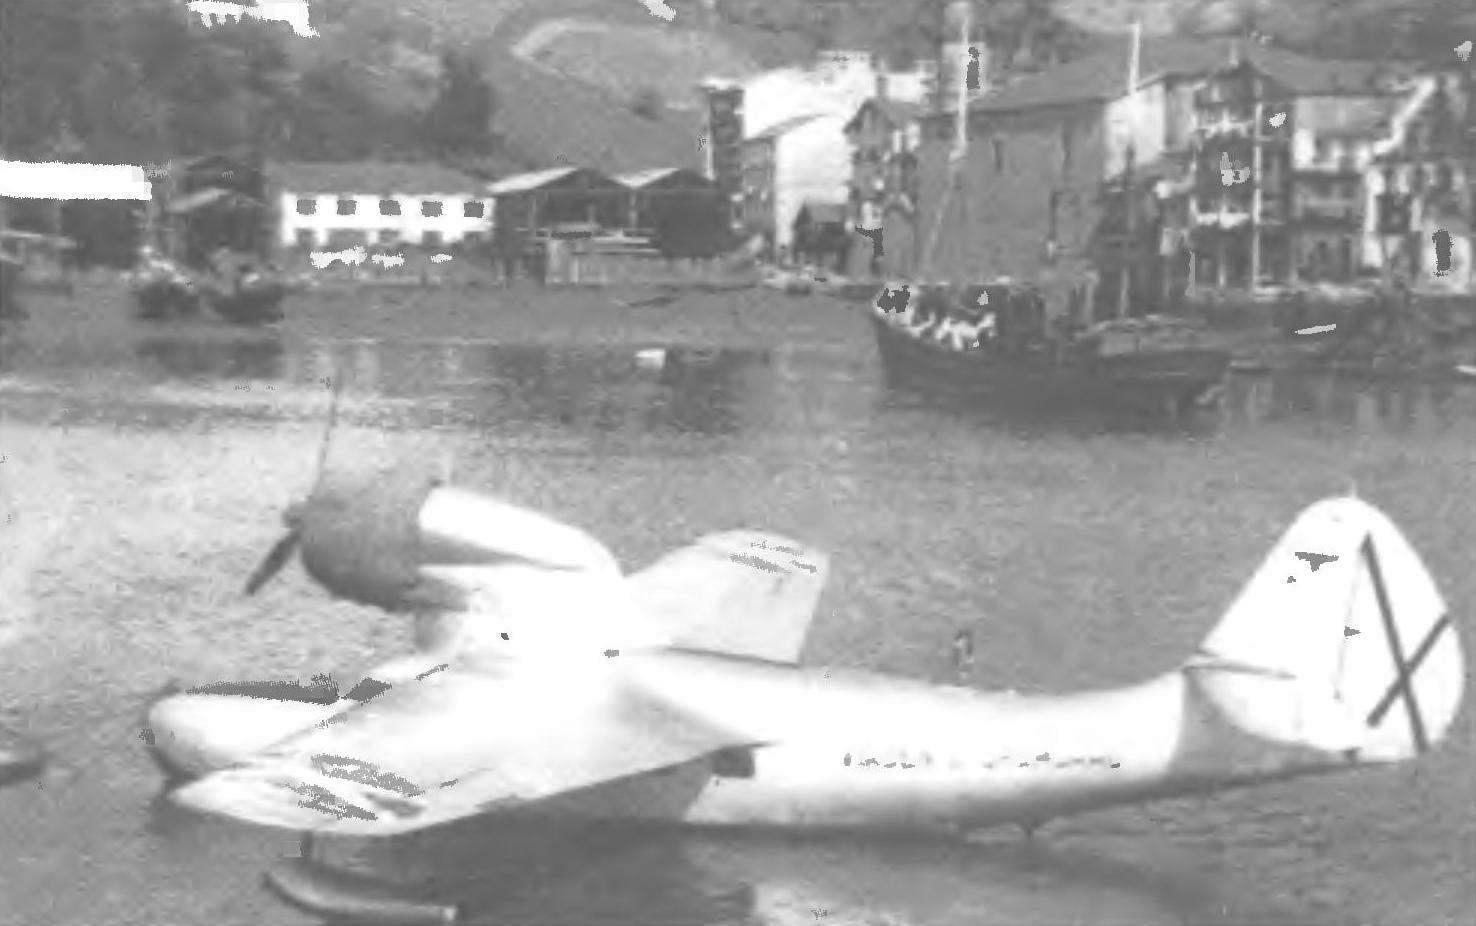 F-91, пришвартованная к стояночному бую